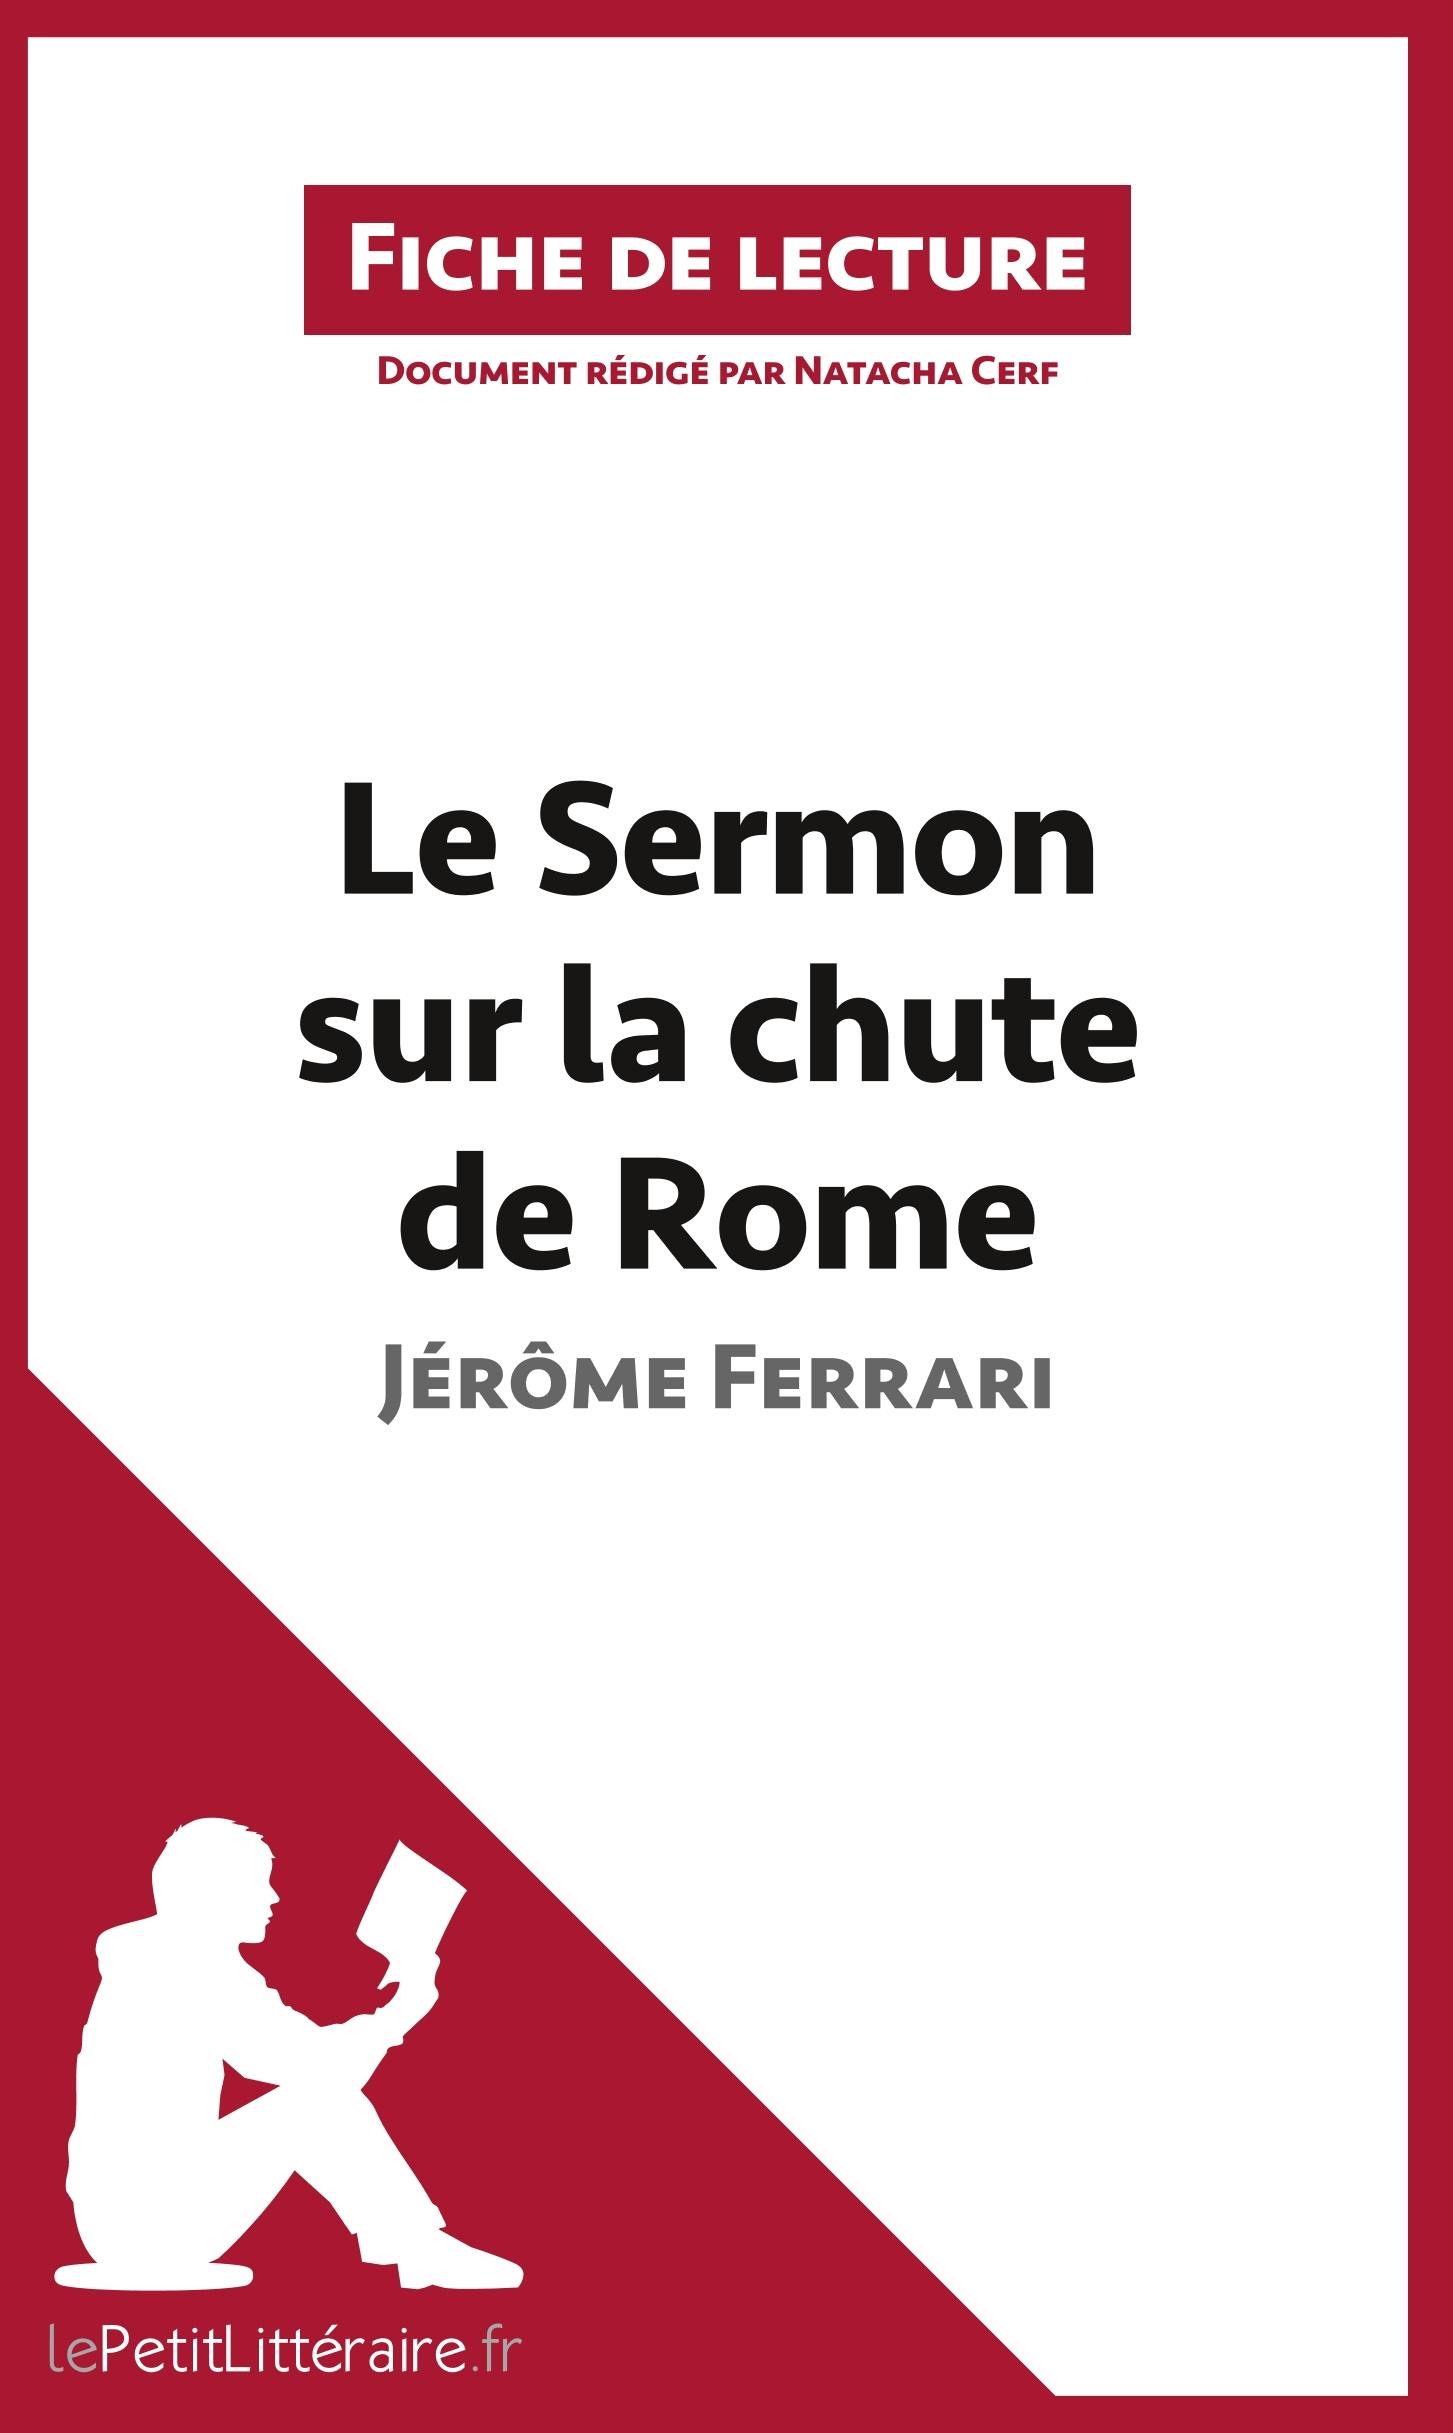 ANALYSE LE SERMON SUR LA CHUTE DE ROME DE JEROME FERRARI ANALYSE COMPLETE DE L